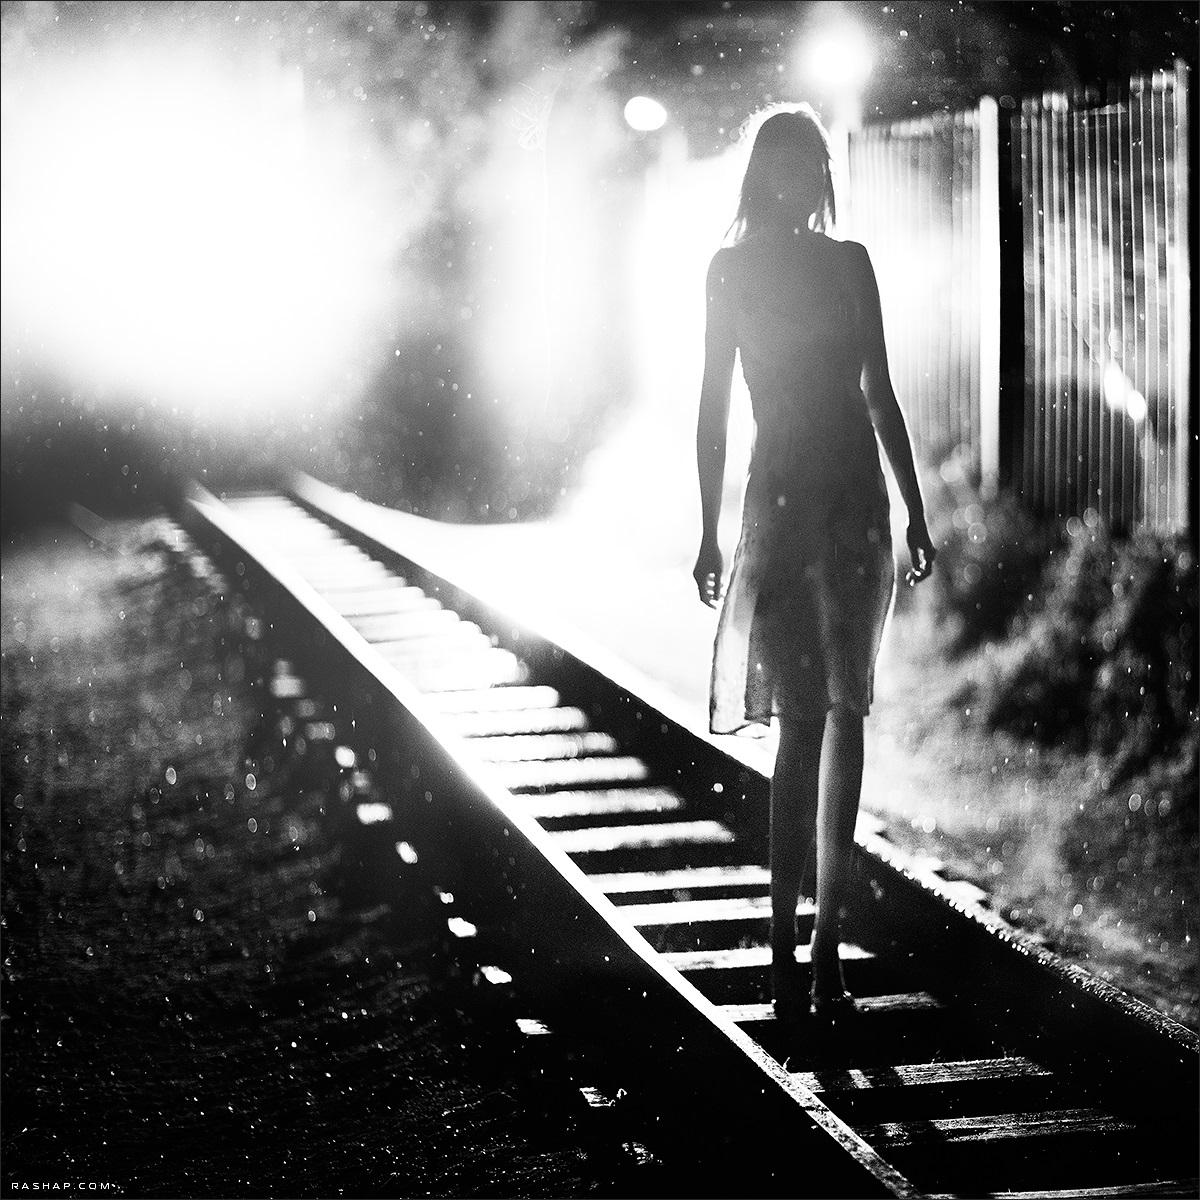 Charming black & white pictures by a photographer Ilya Rashap - 24